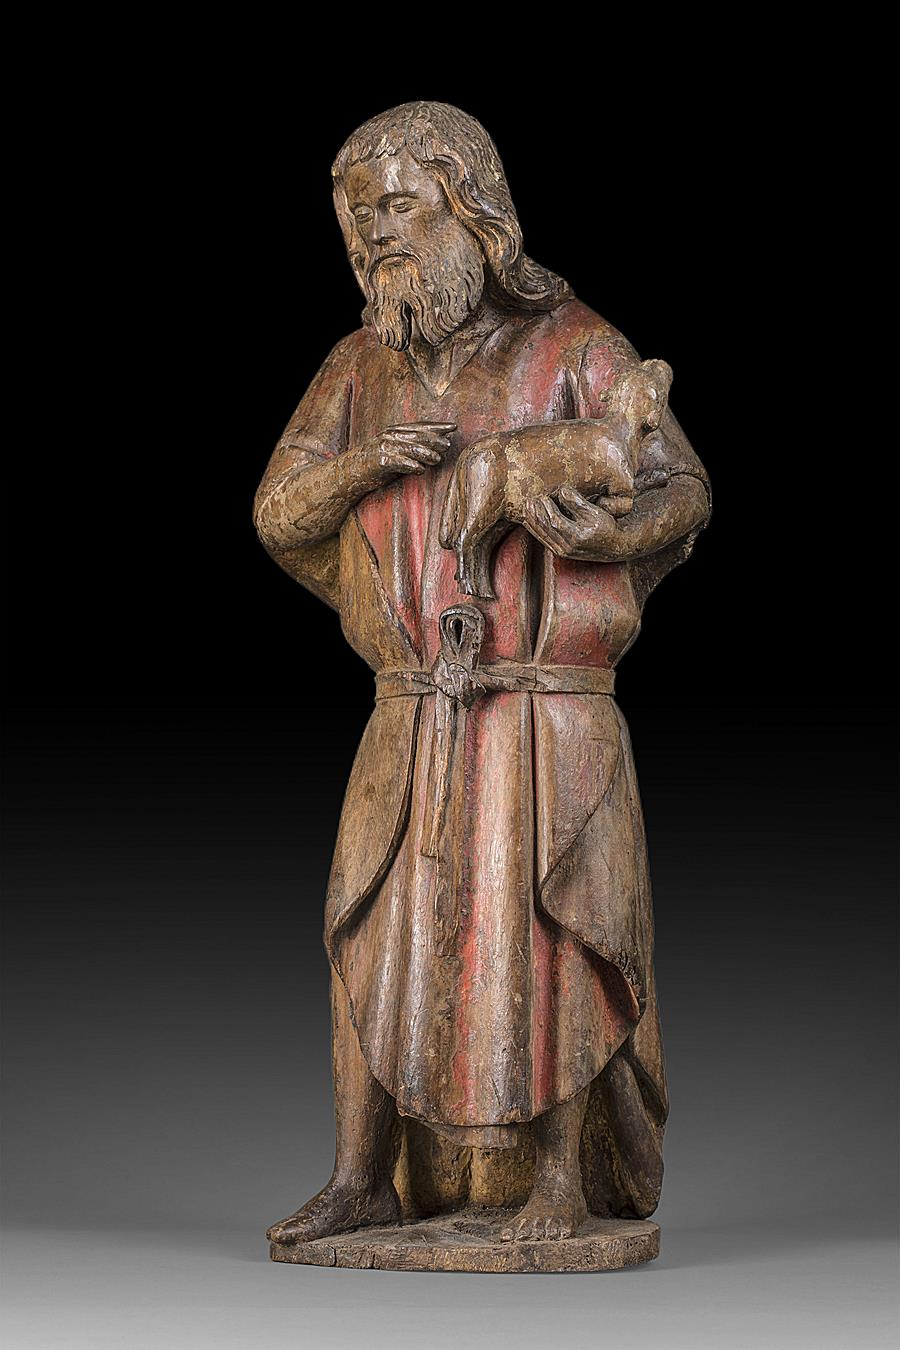 SAINT JOHN THE BAPTIST BURGUNDY SECOND HALF OF THE 15TH CENTURY